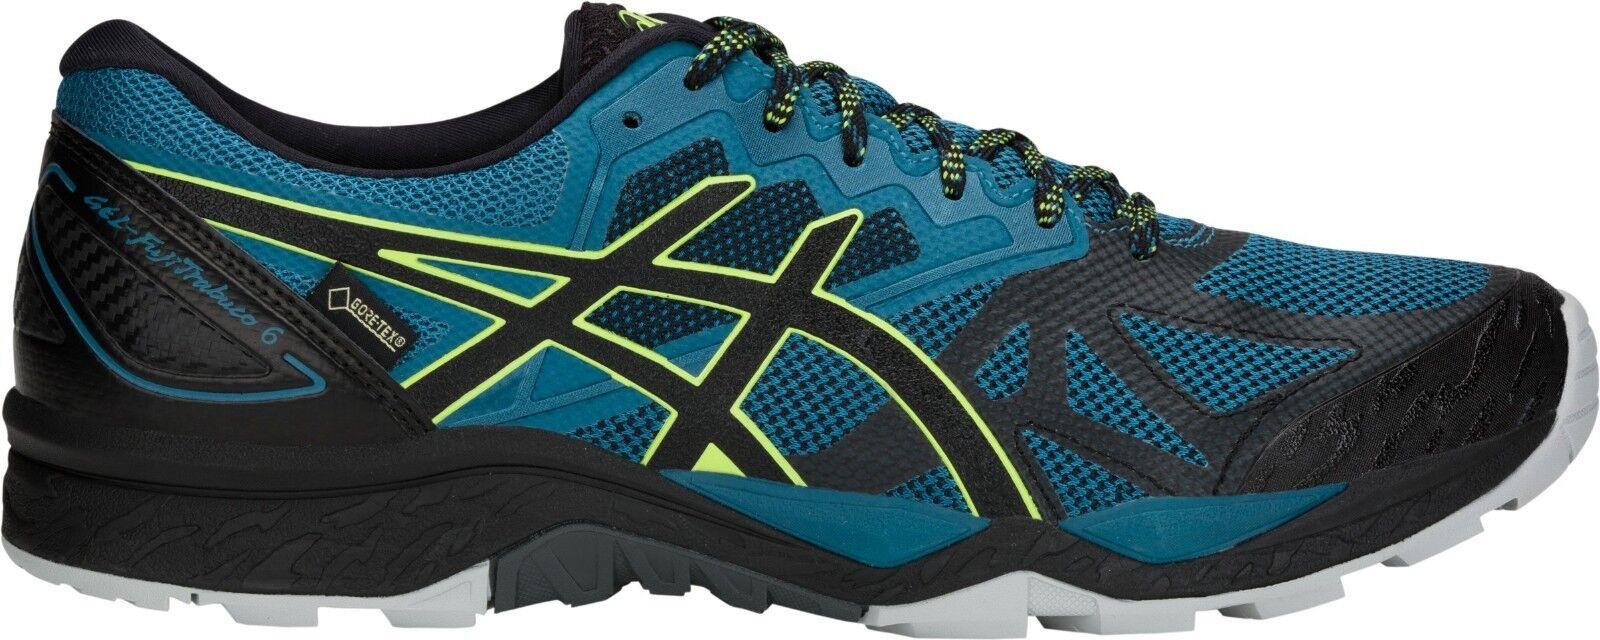 NEW Asics Gel Trabuco  6 GTX Mens Trail Running scarpe (D) (400)  grandi risparmi